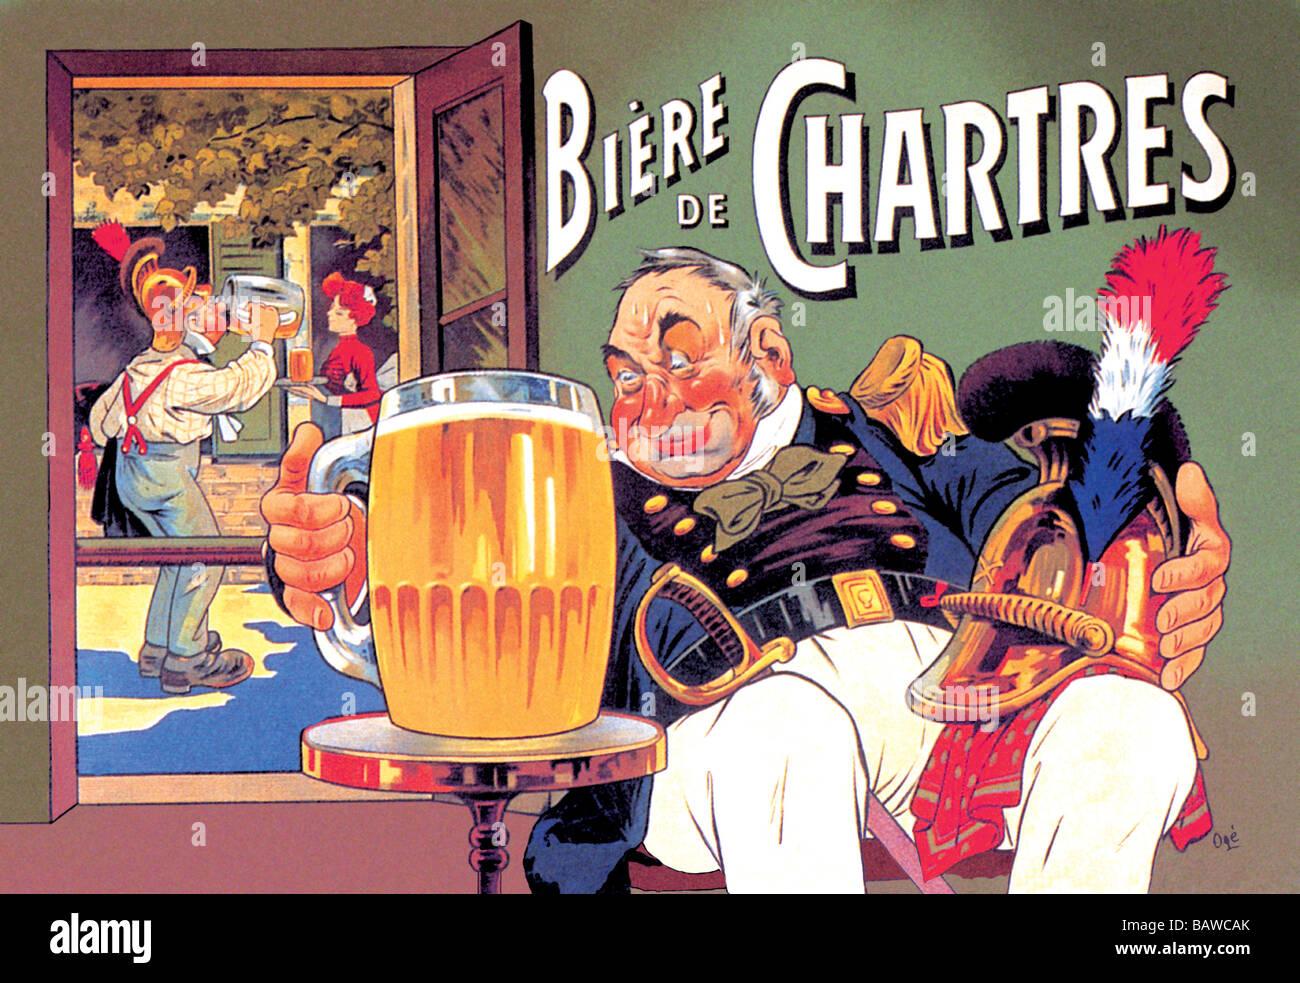 Beer Bieres De Chartres French Advert Sign